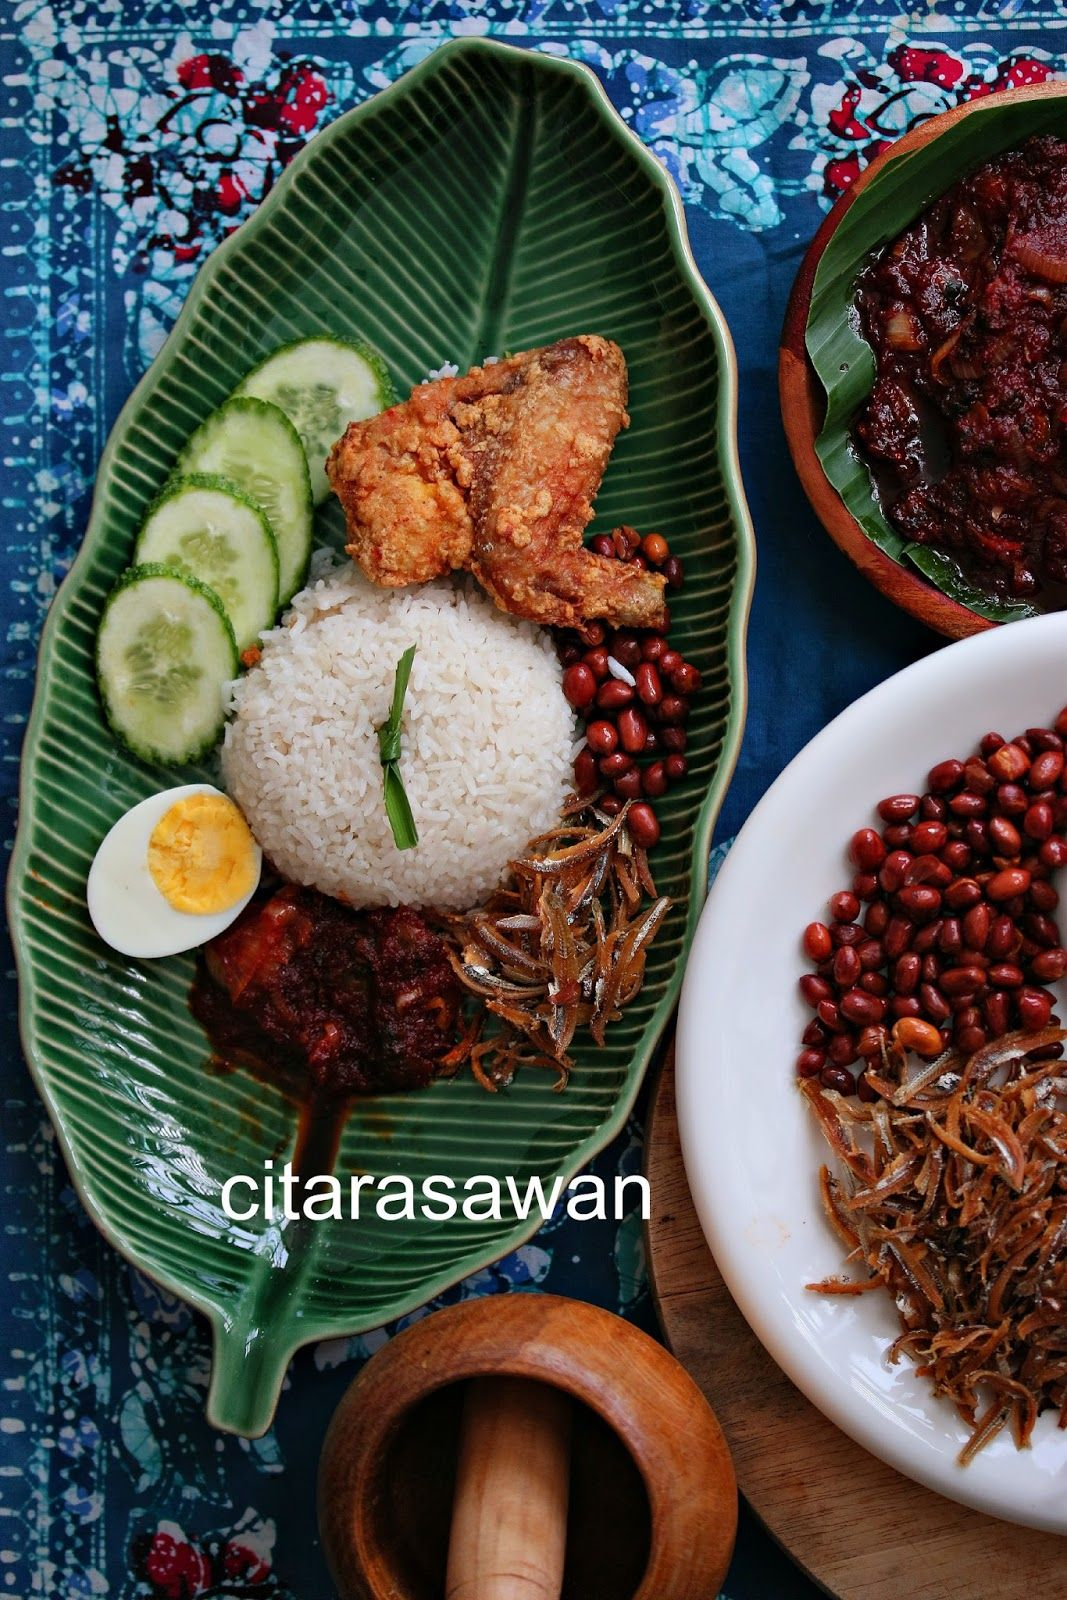 Nasi Lemak Paling Sedap Resepi Terbaik Resep Masakan Malaysia Makanan Dan Minuman Penyajian Makanan